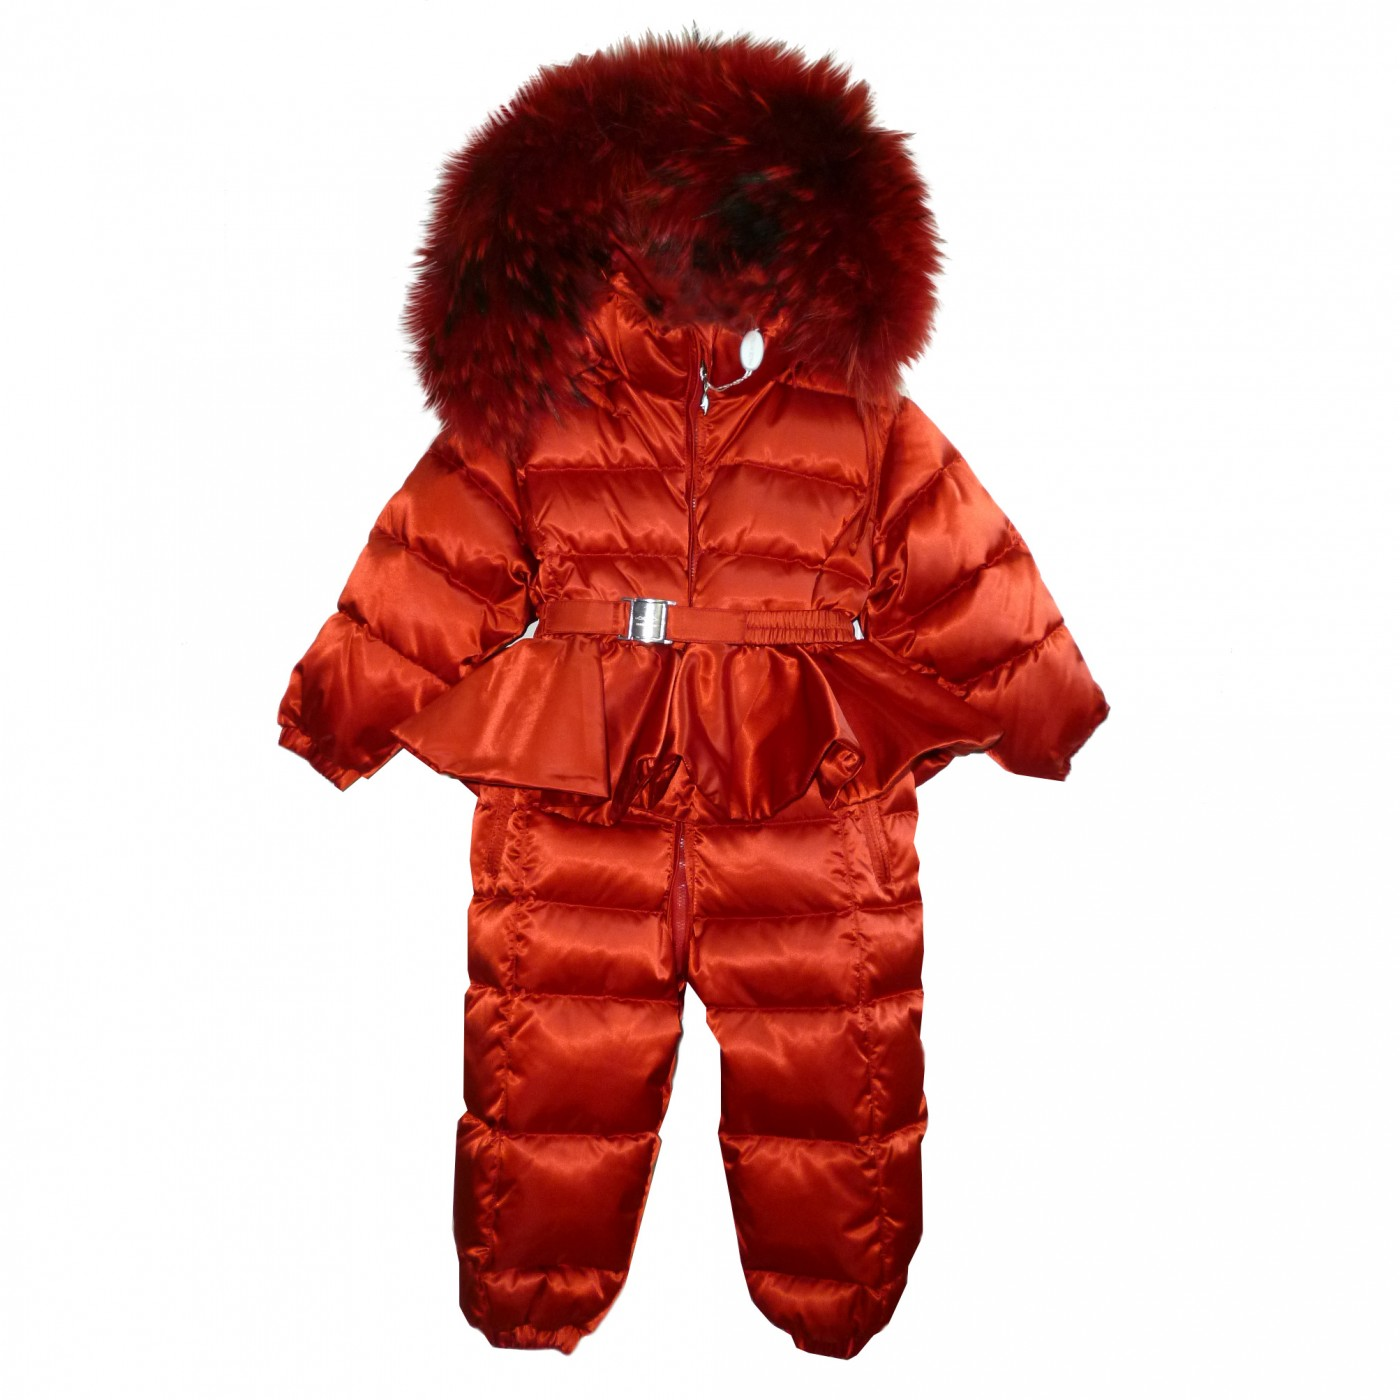 Красный зимний комбинезон Manudieci P1130390